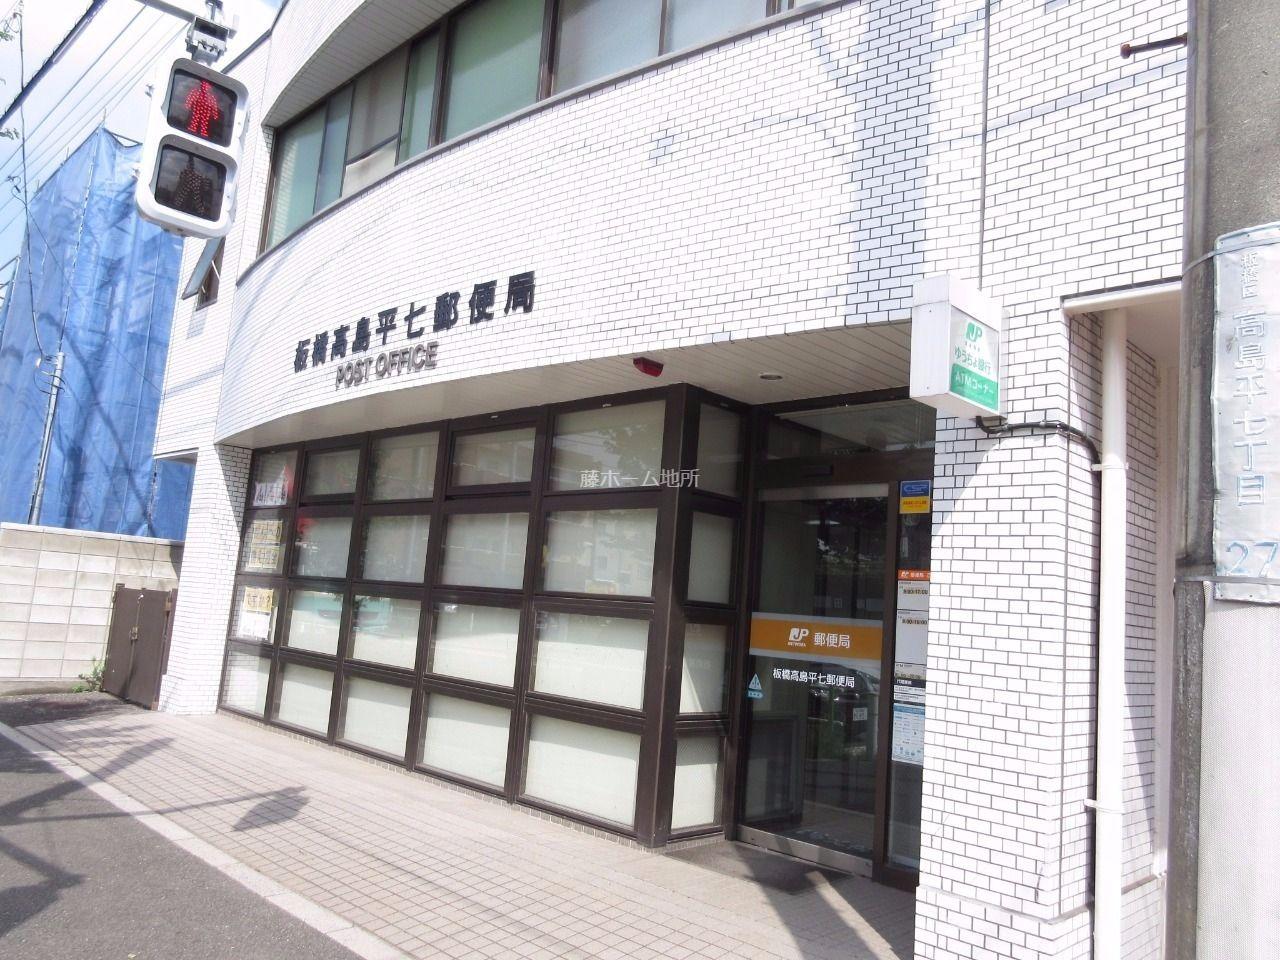 板橋高島平七郵便局まで徒歩5分(450m)